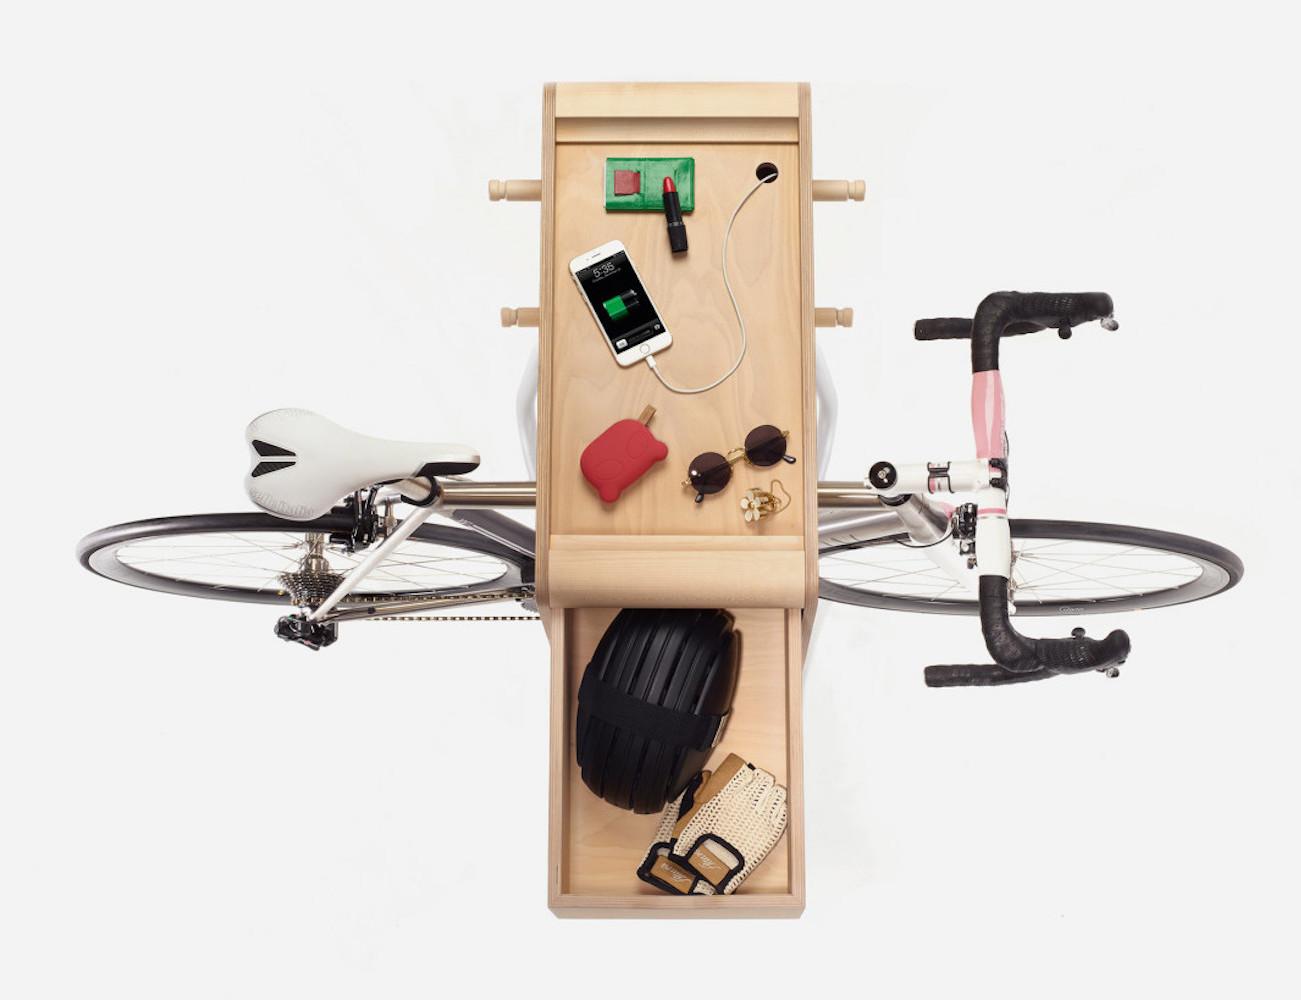 Bike Butler – The Smartest Bike Stand Ever